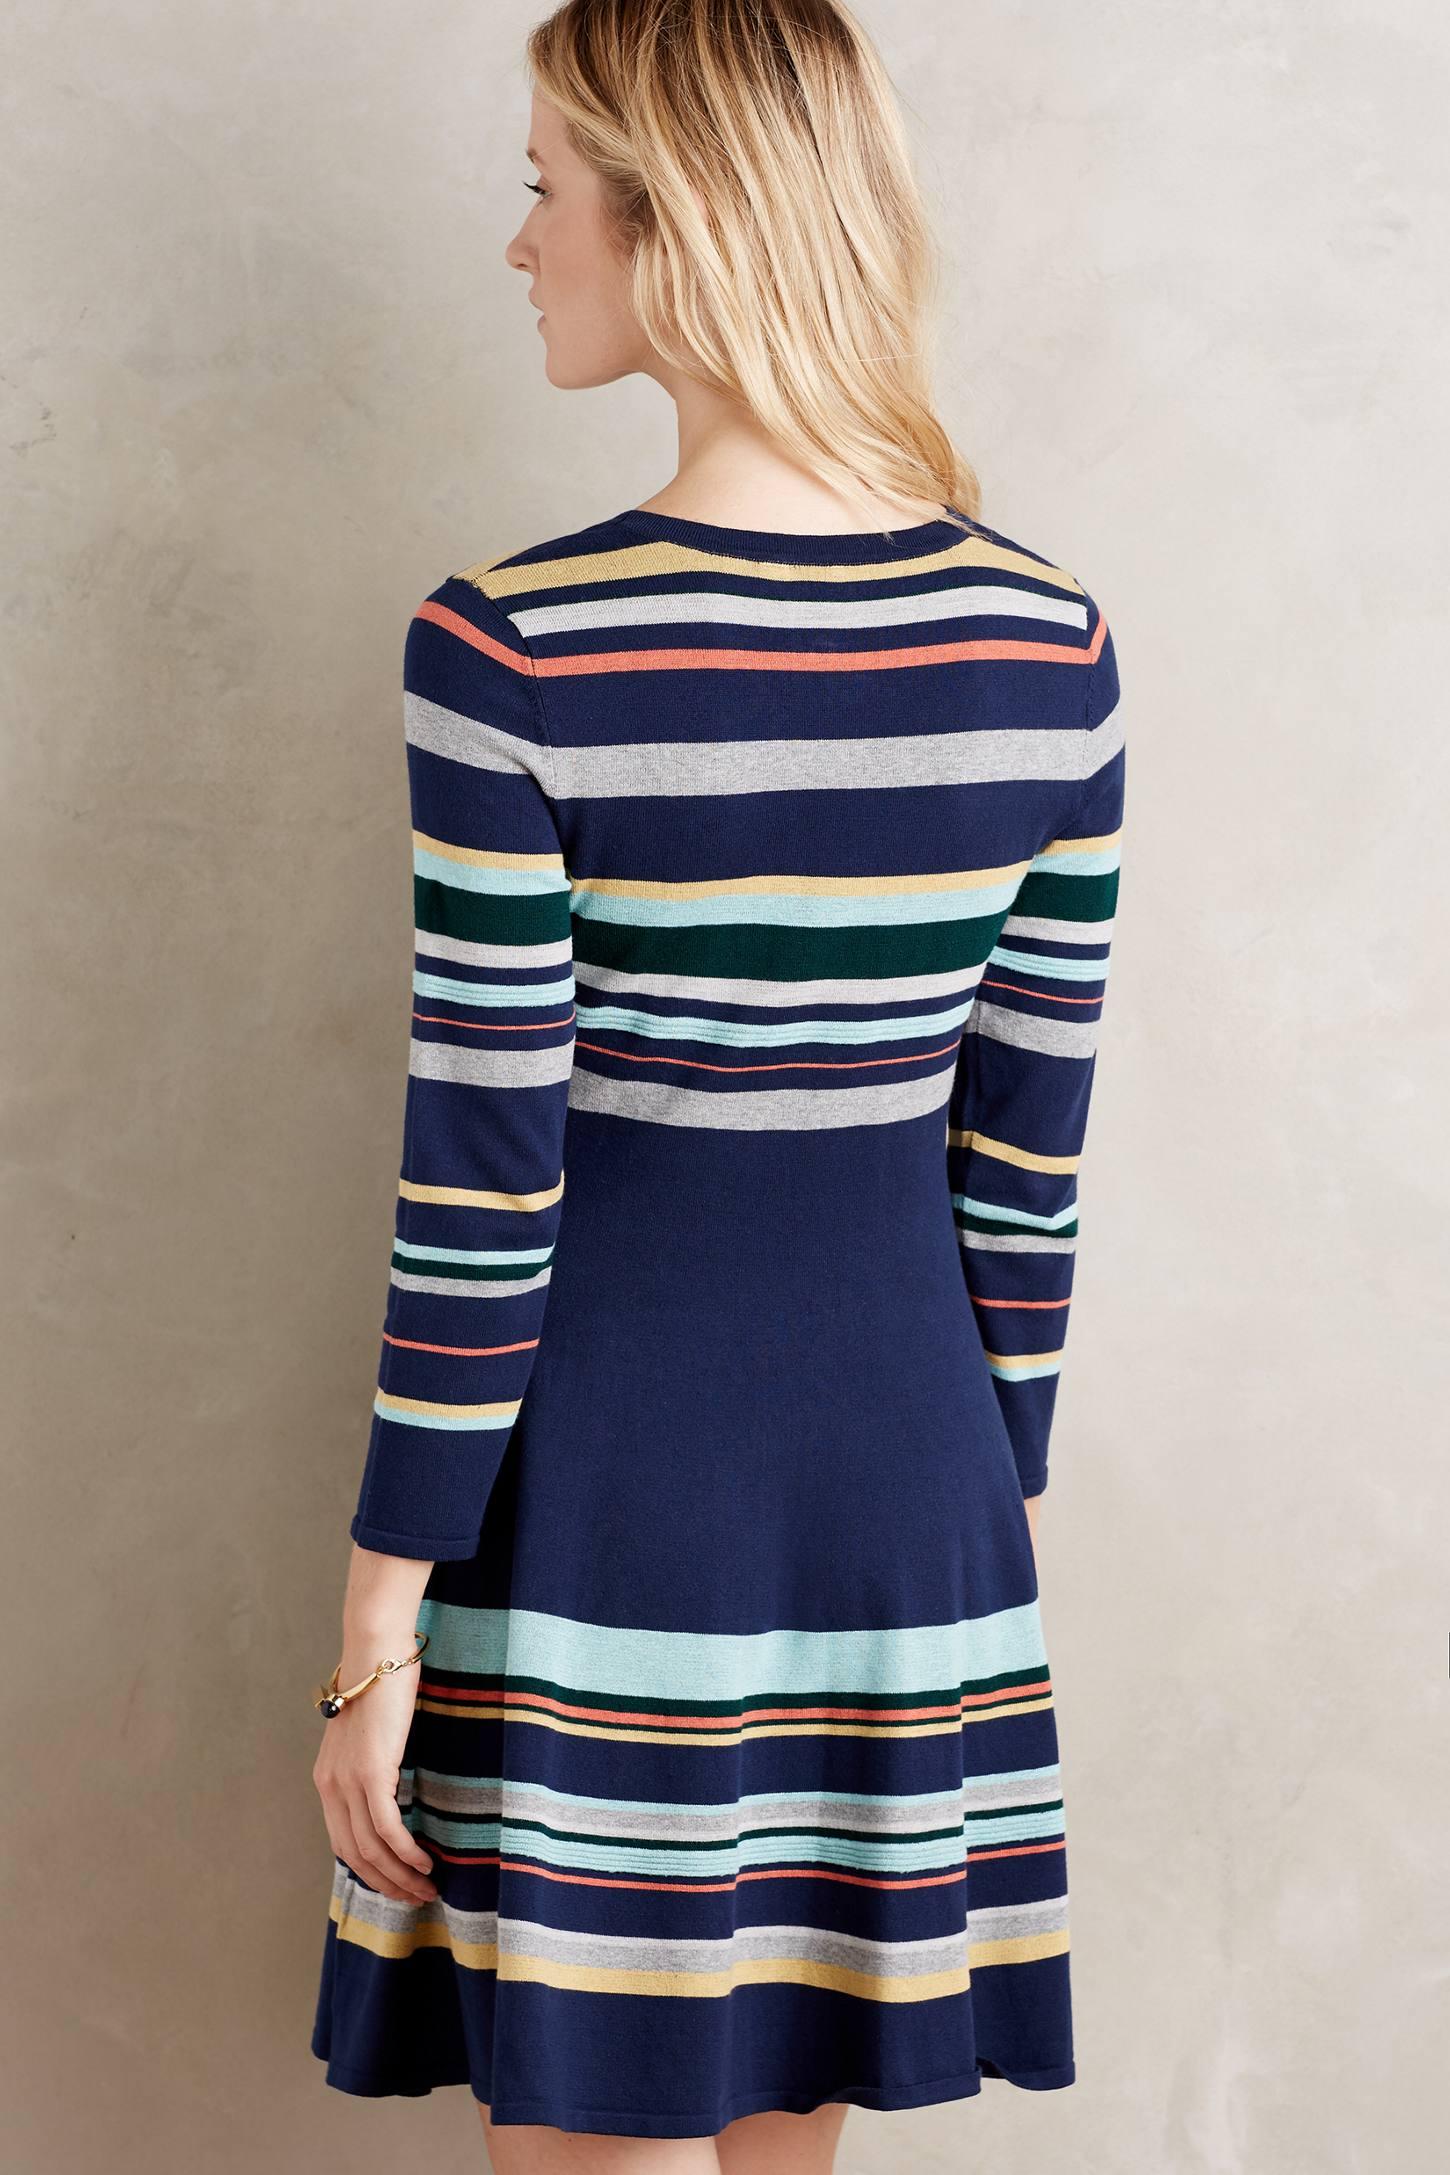 Scooped Sweaterdress